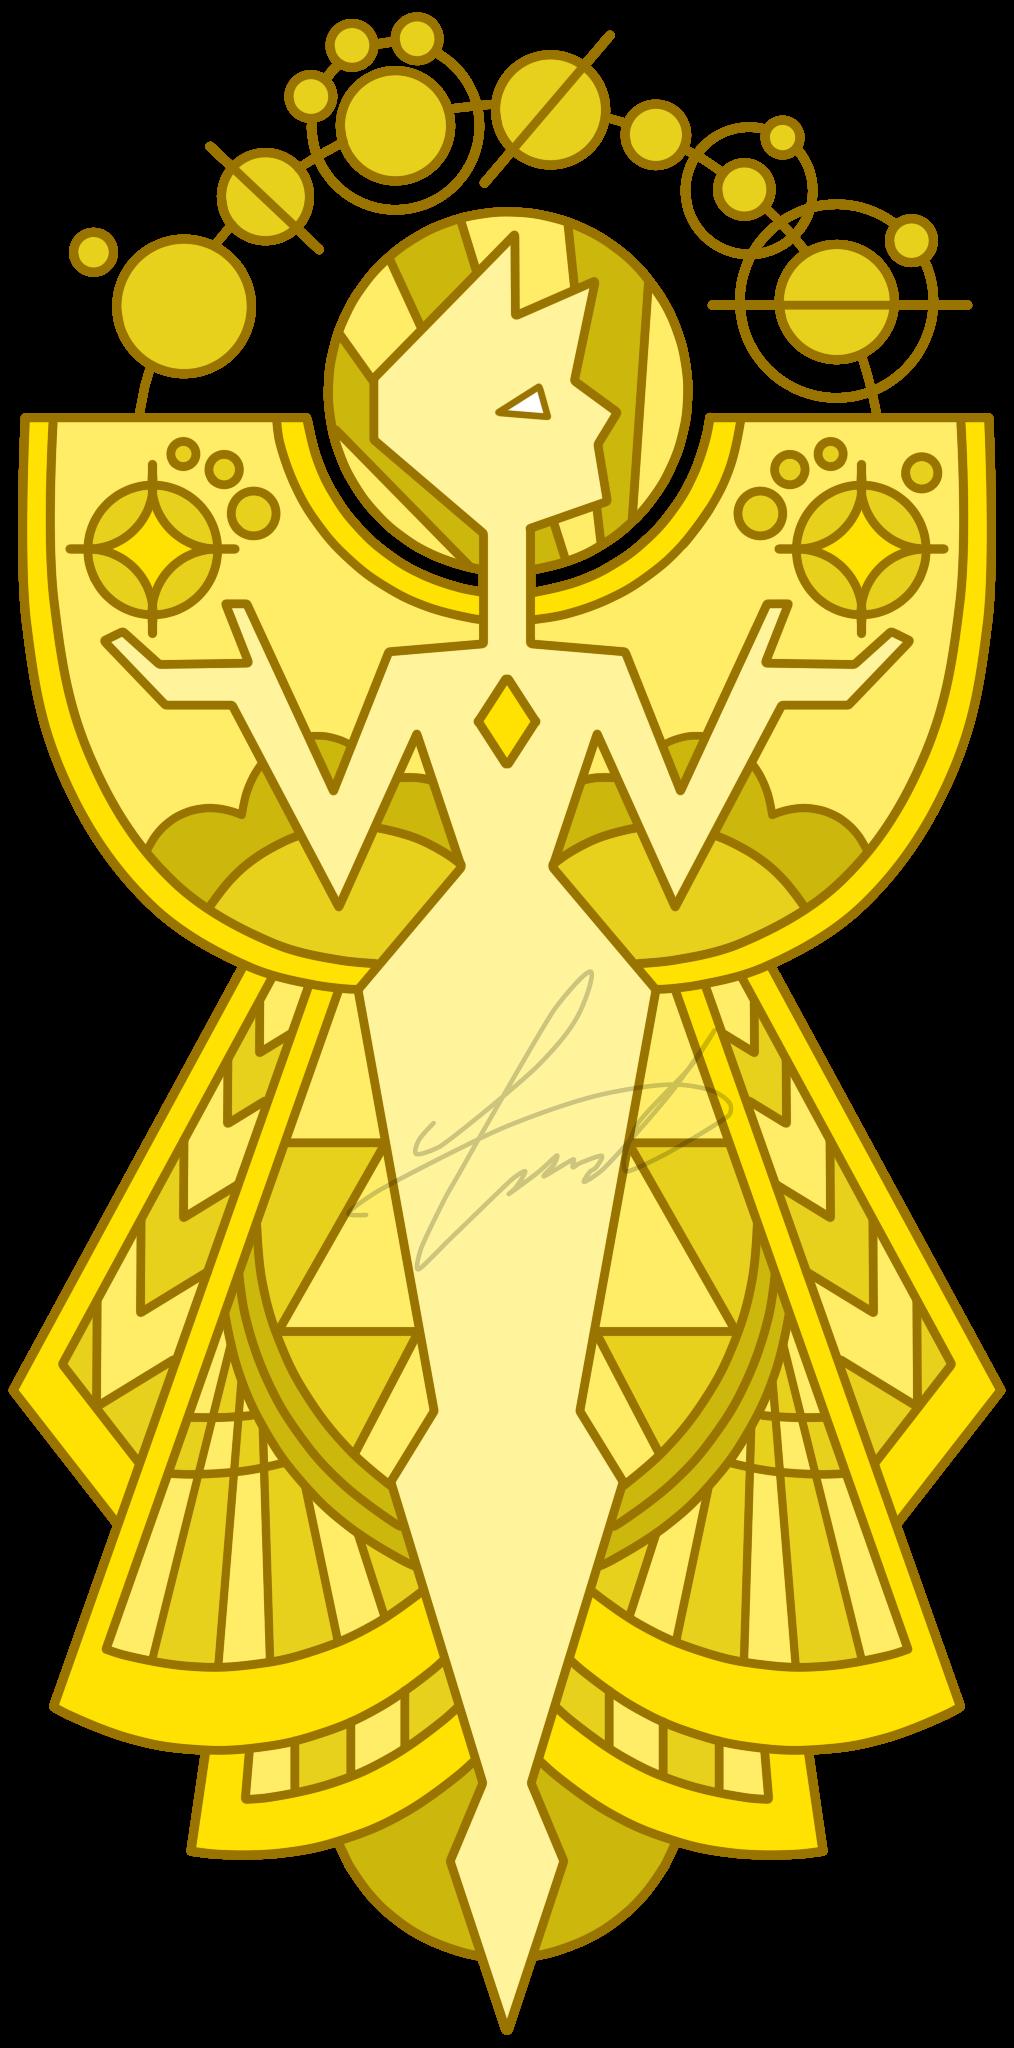 Steven universe roleplay wiki. Clipart diamond yellow diamond